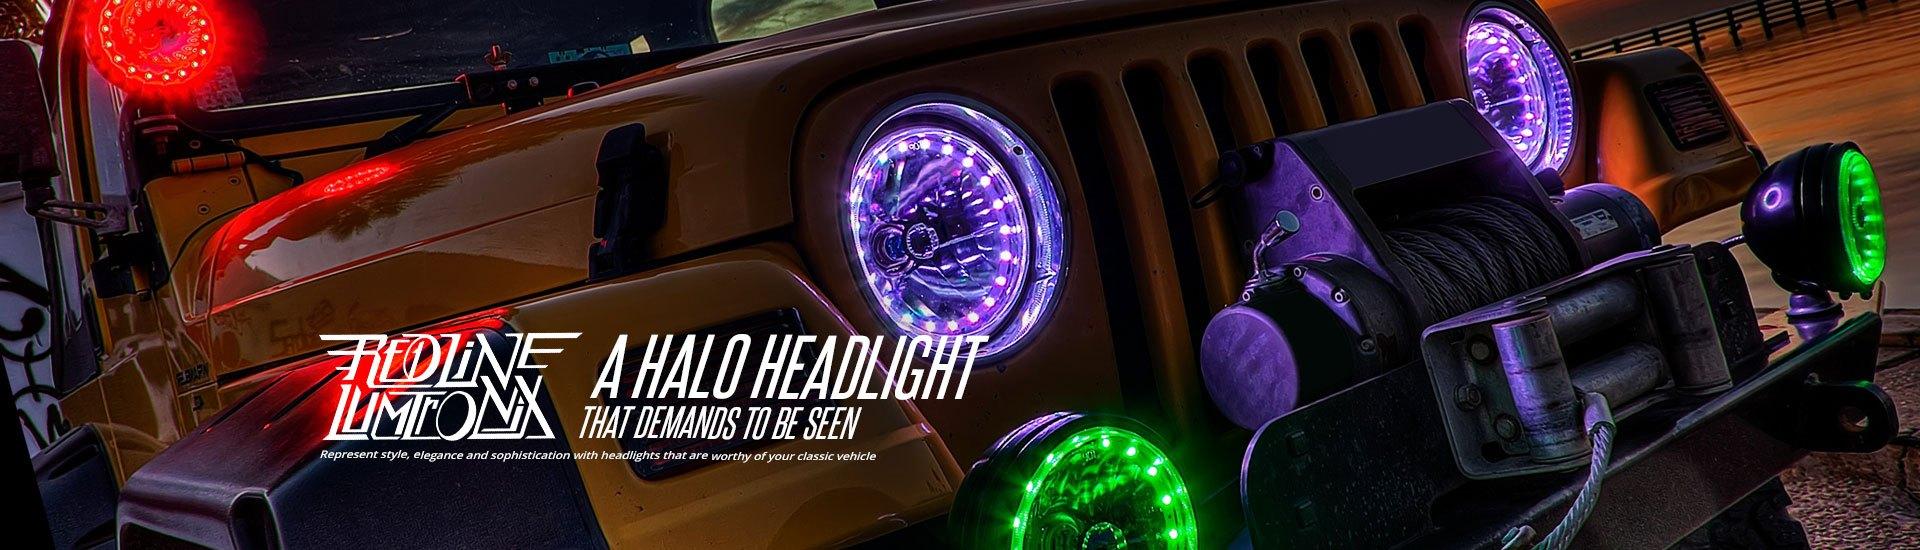 Automotive LED Lights   Bars, Strips, Halos, Bulbs, Custom Light Kits